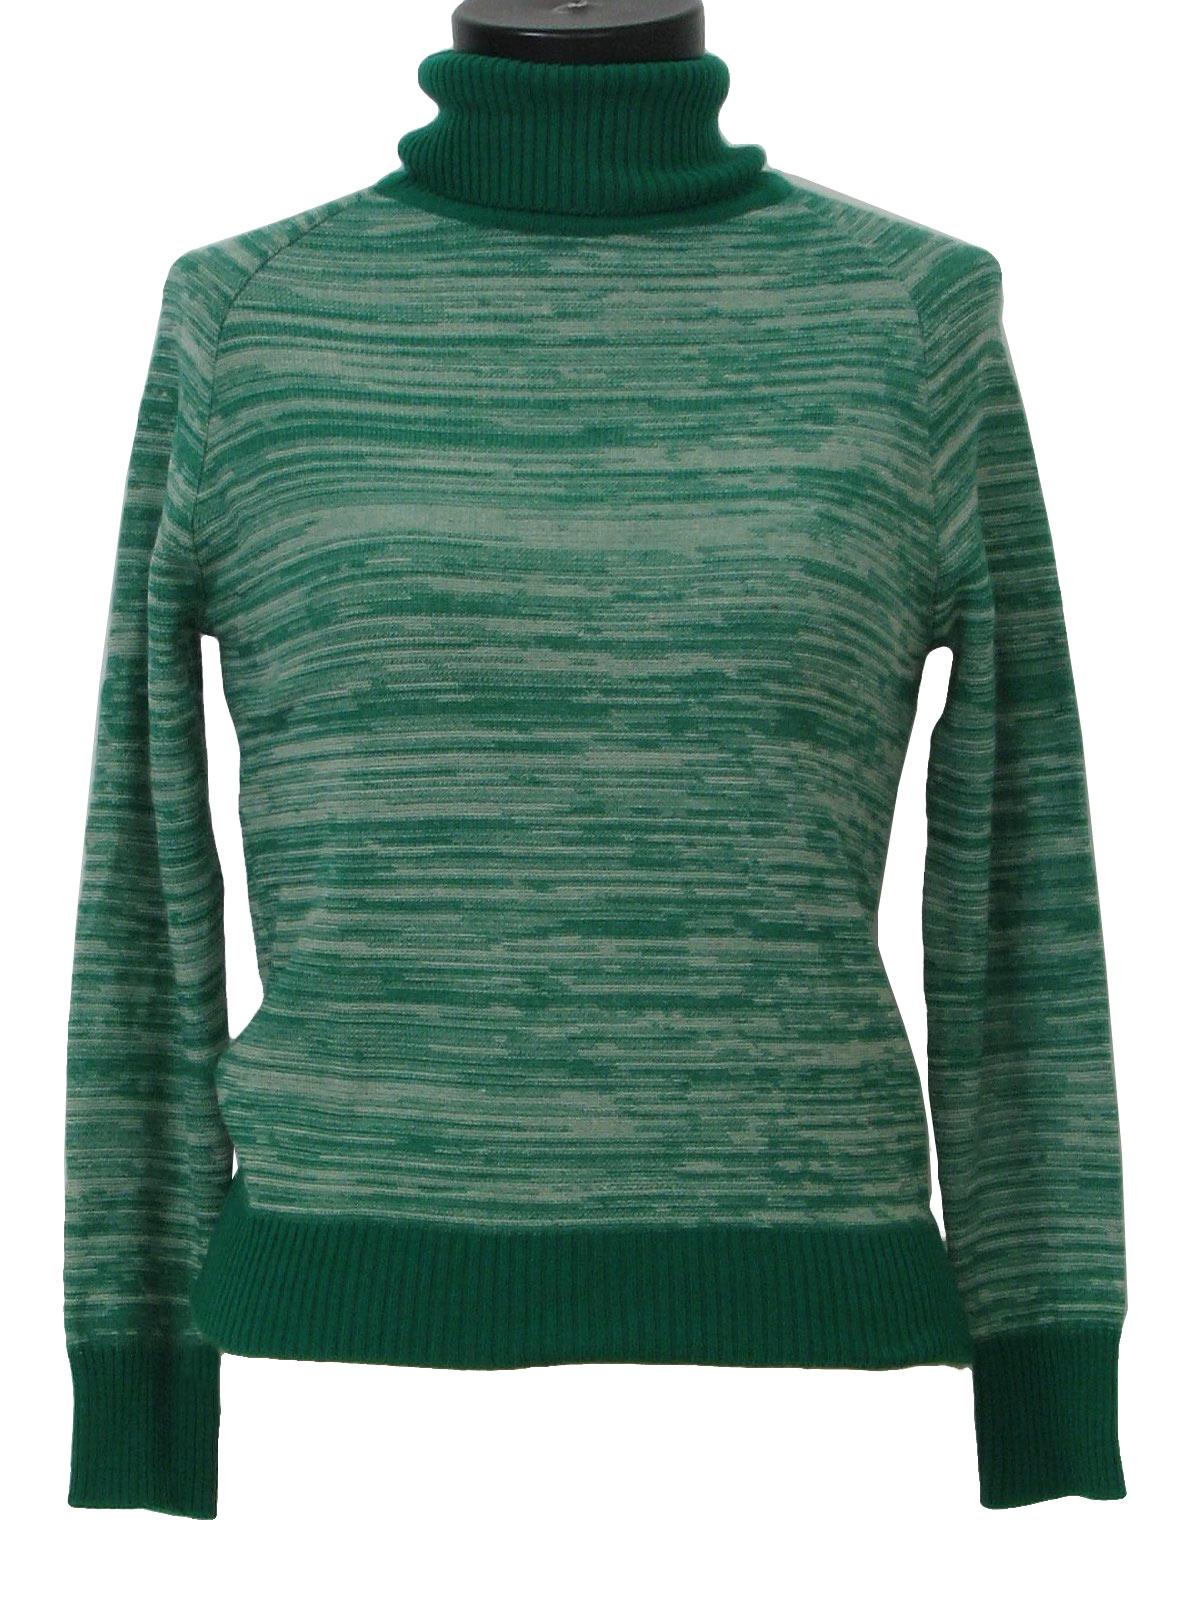 Retro 1960s Knit Shirt: 60s -no label- Womens or girls true green ...